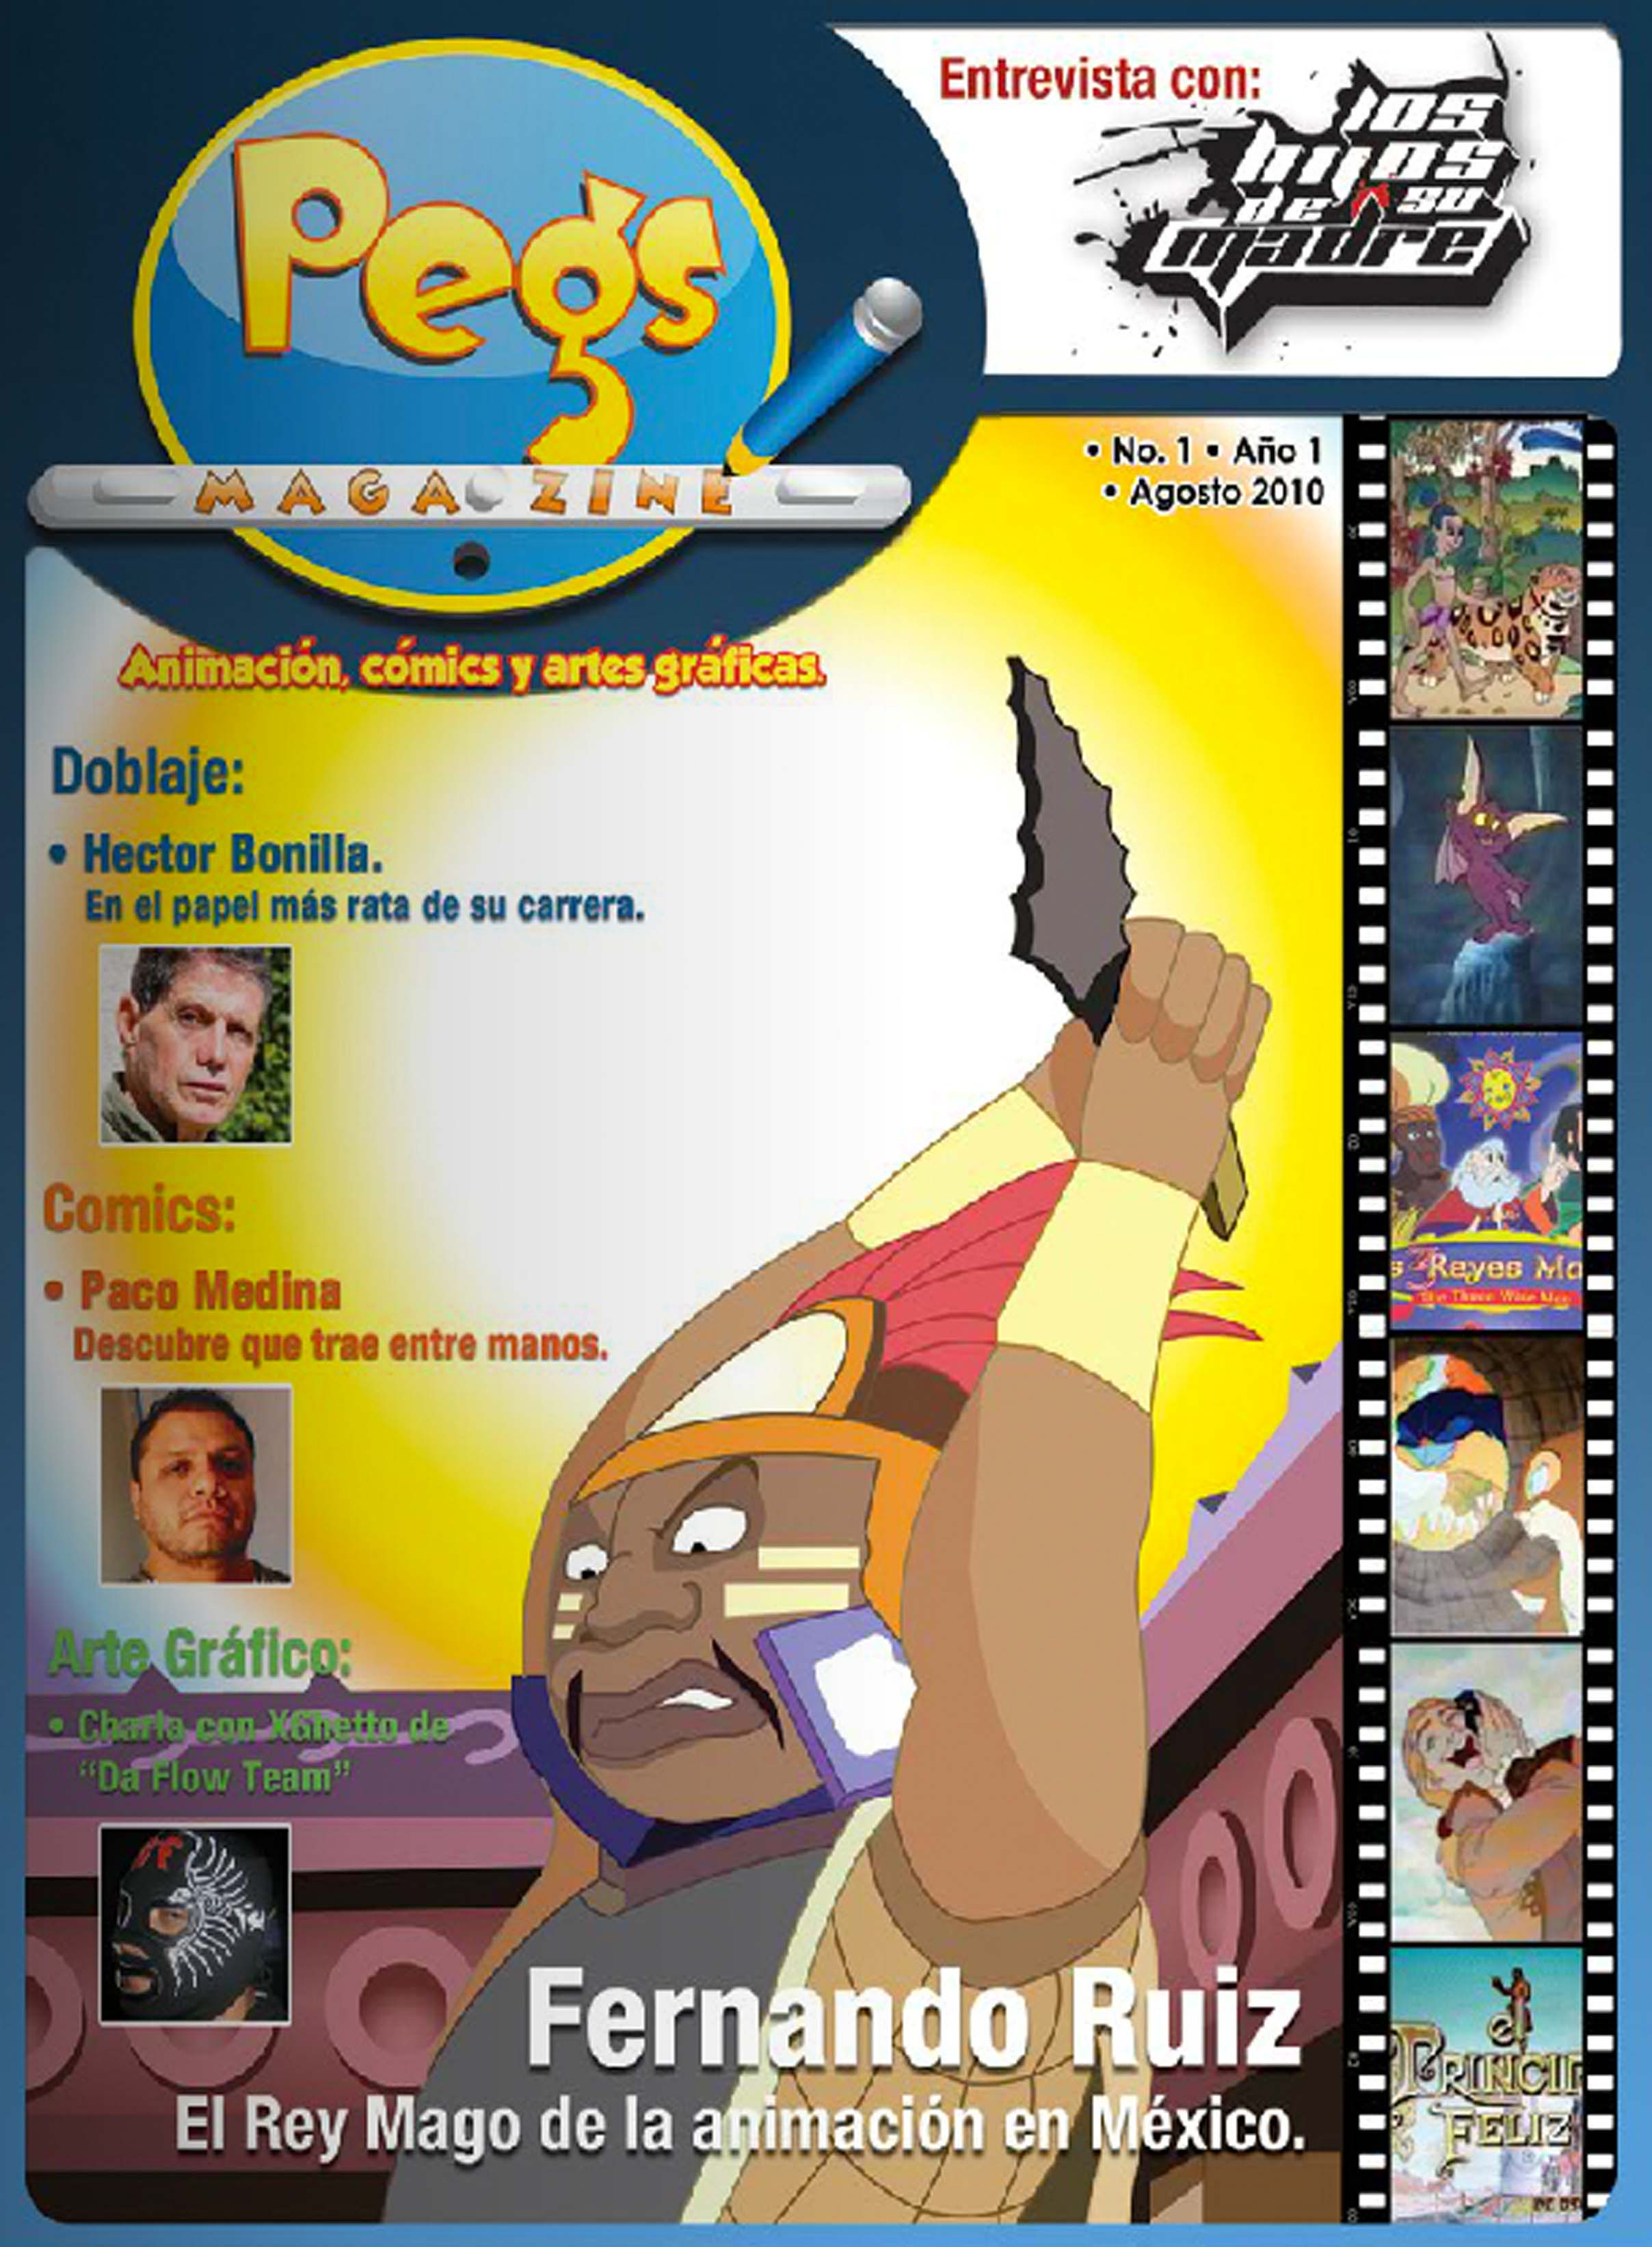 Pegs Magazine1.jpg